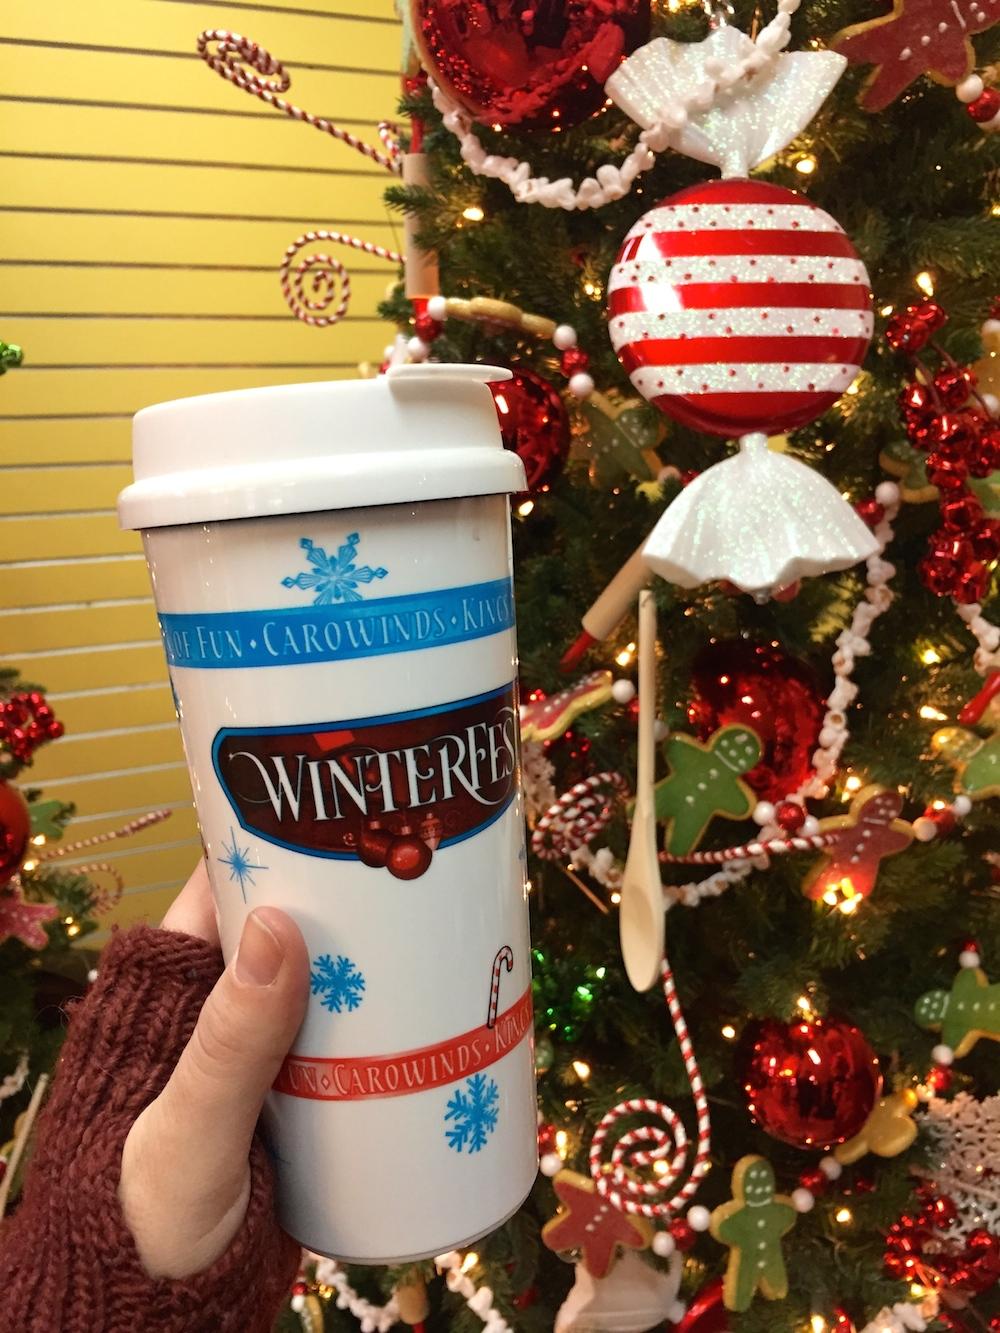 Souvenir hot chocolate mug at Worlds of Fun's WinterFest in Kansas City, Missouri